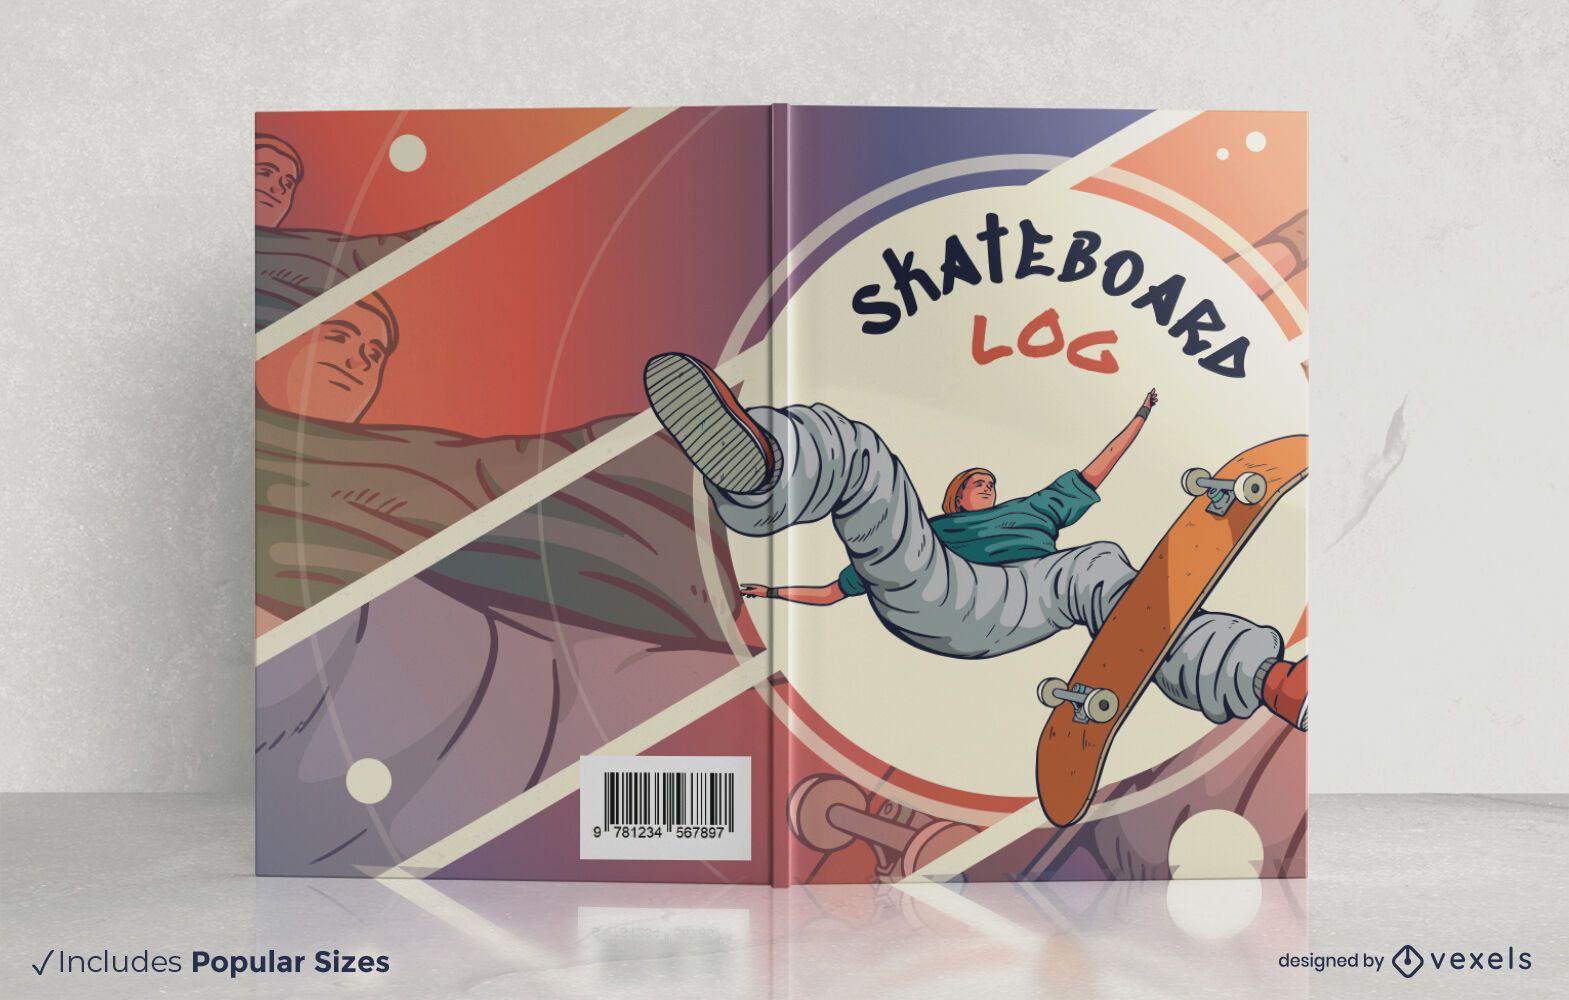 Skateboard Logbuch Cover Design